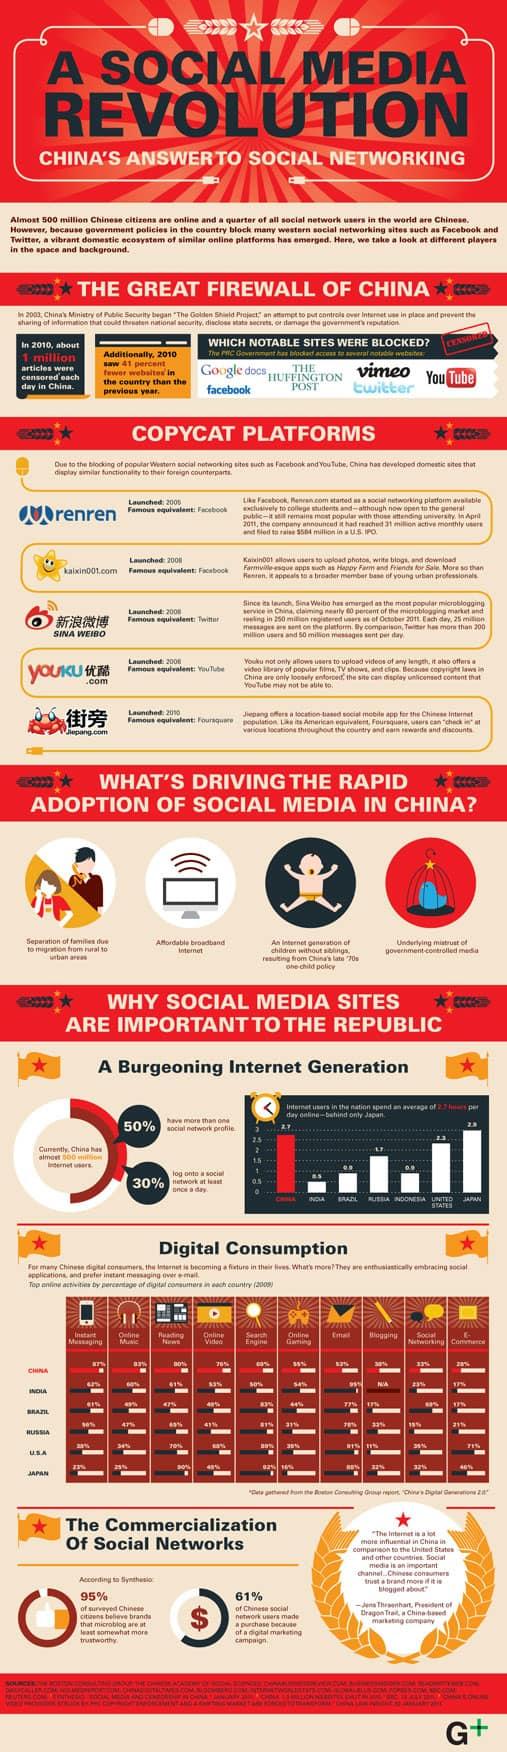 SocialMediaRevolution.jpg